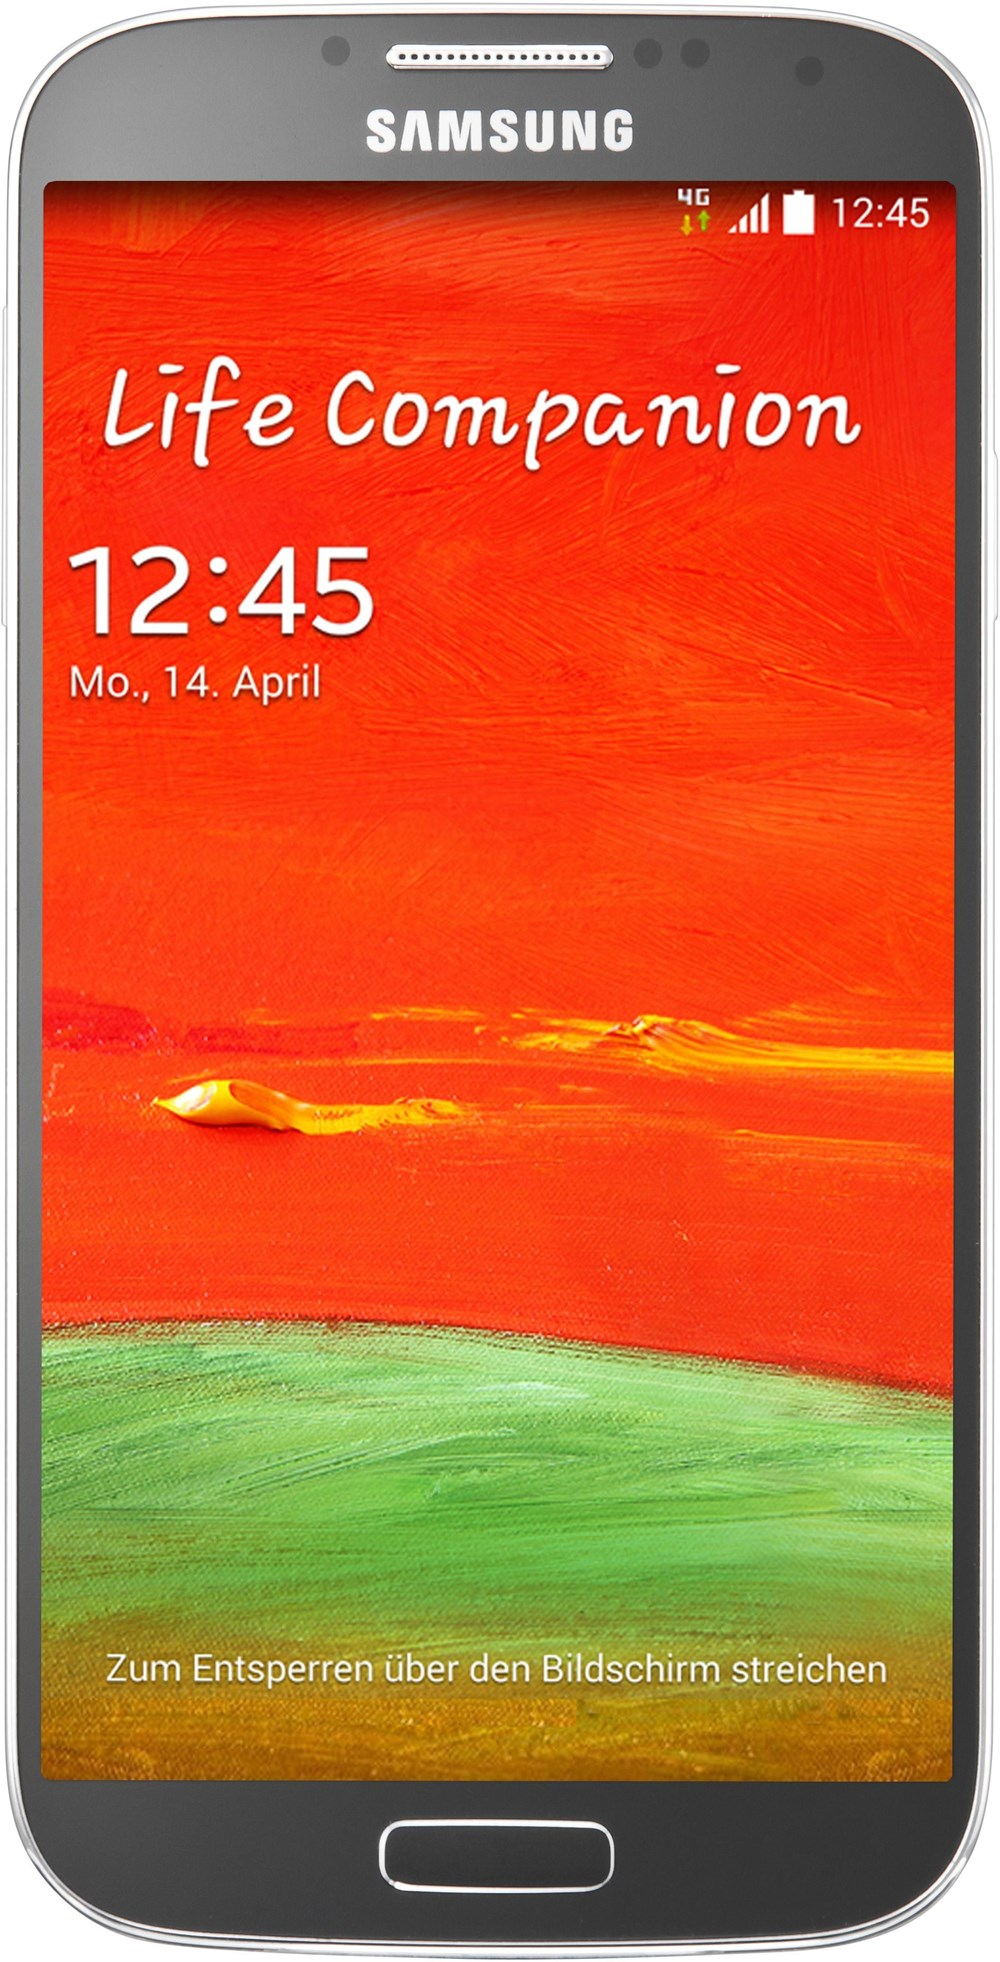 Samsung Galaxy S4 i9515, 16 GB, Smartphone ohne Vertrag/SIMlock, silber (Handy) GT-I9515ZSADBT